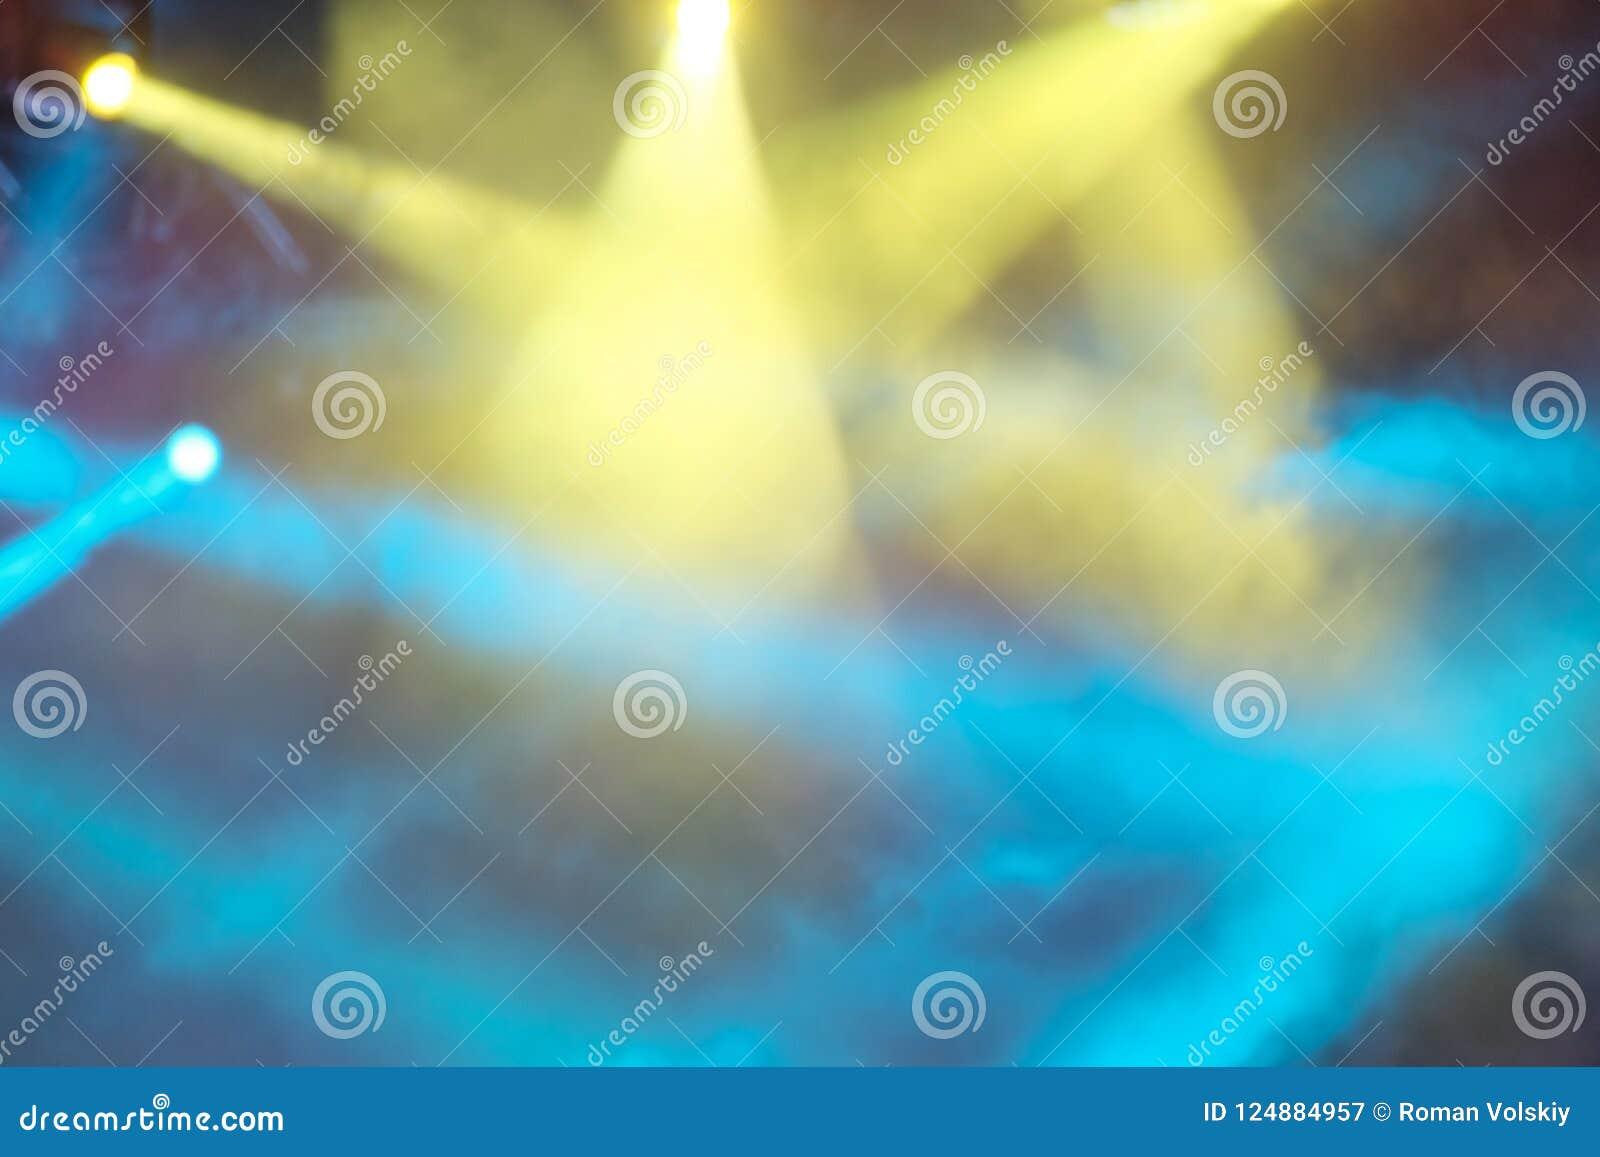 As luzes amarelas e azuis do concerto brilham através do fumo Fundo bonito abstrato de raios de luz coloridos brilhantes blurry